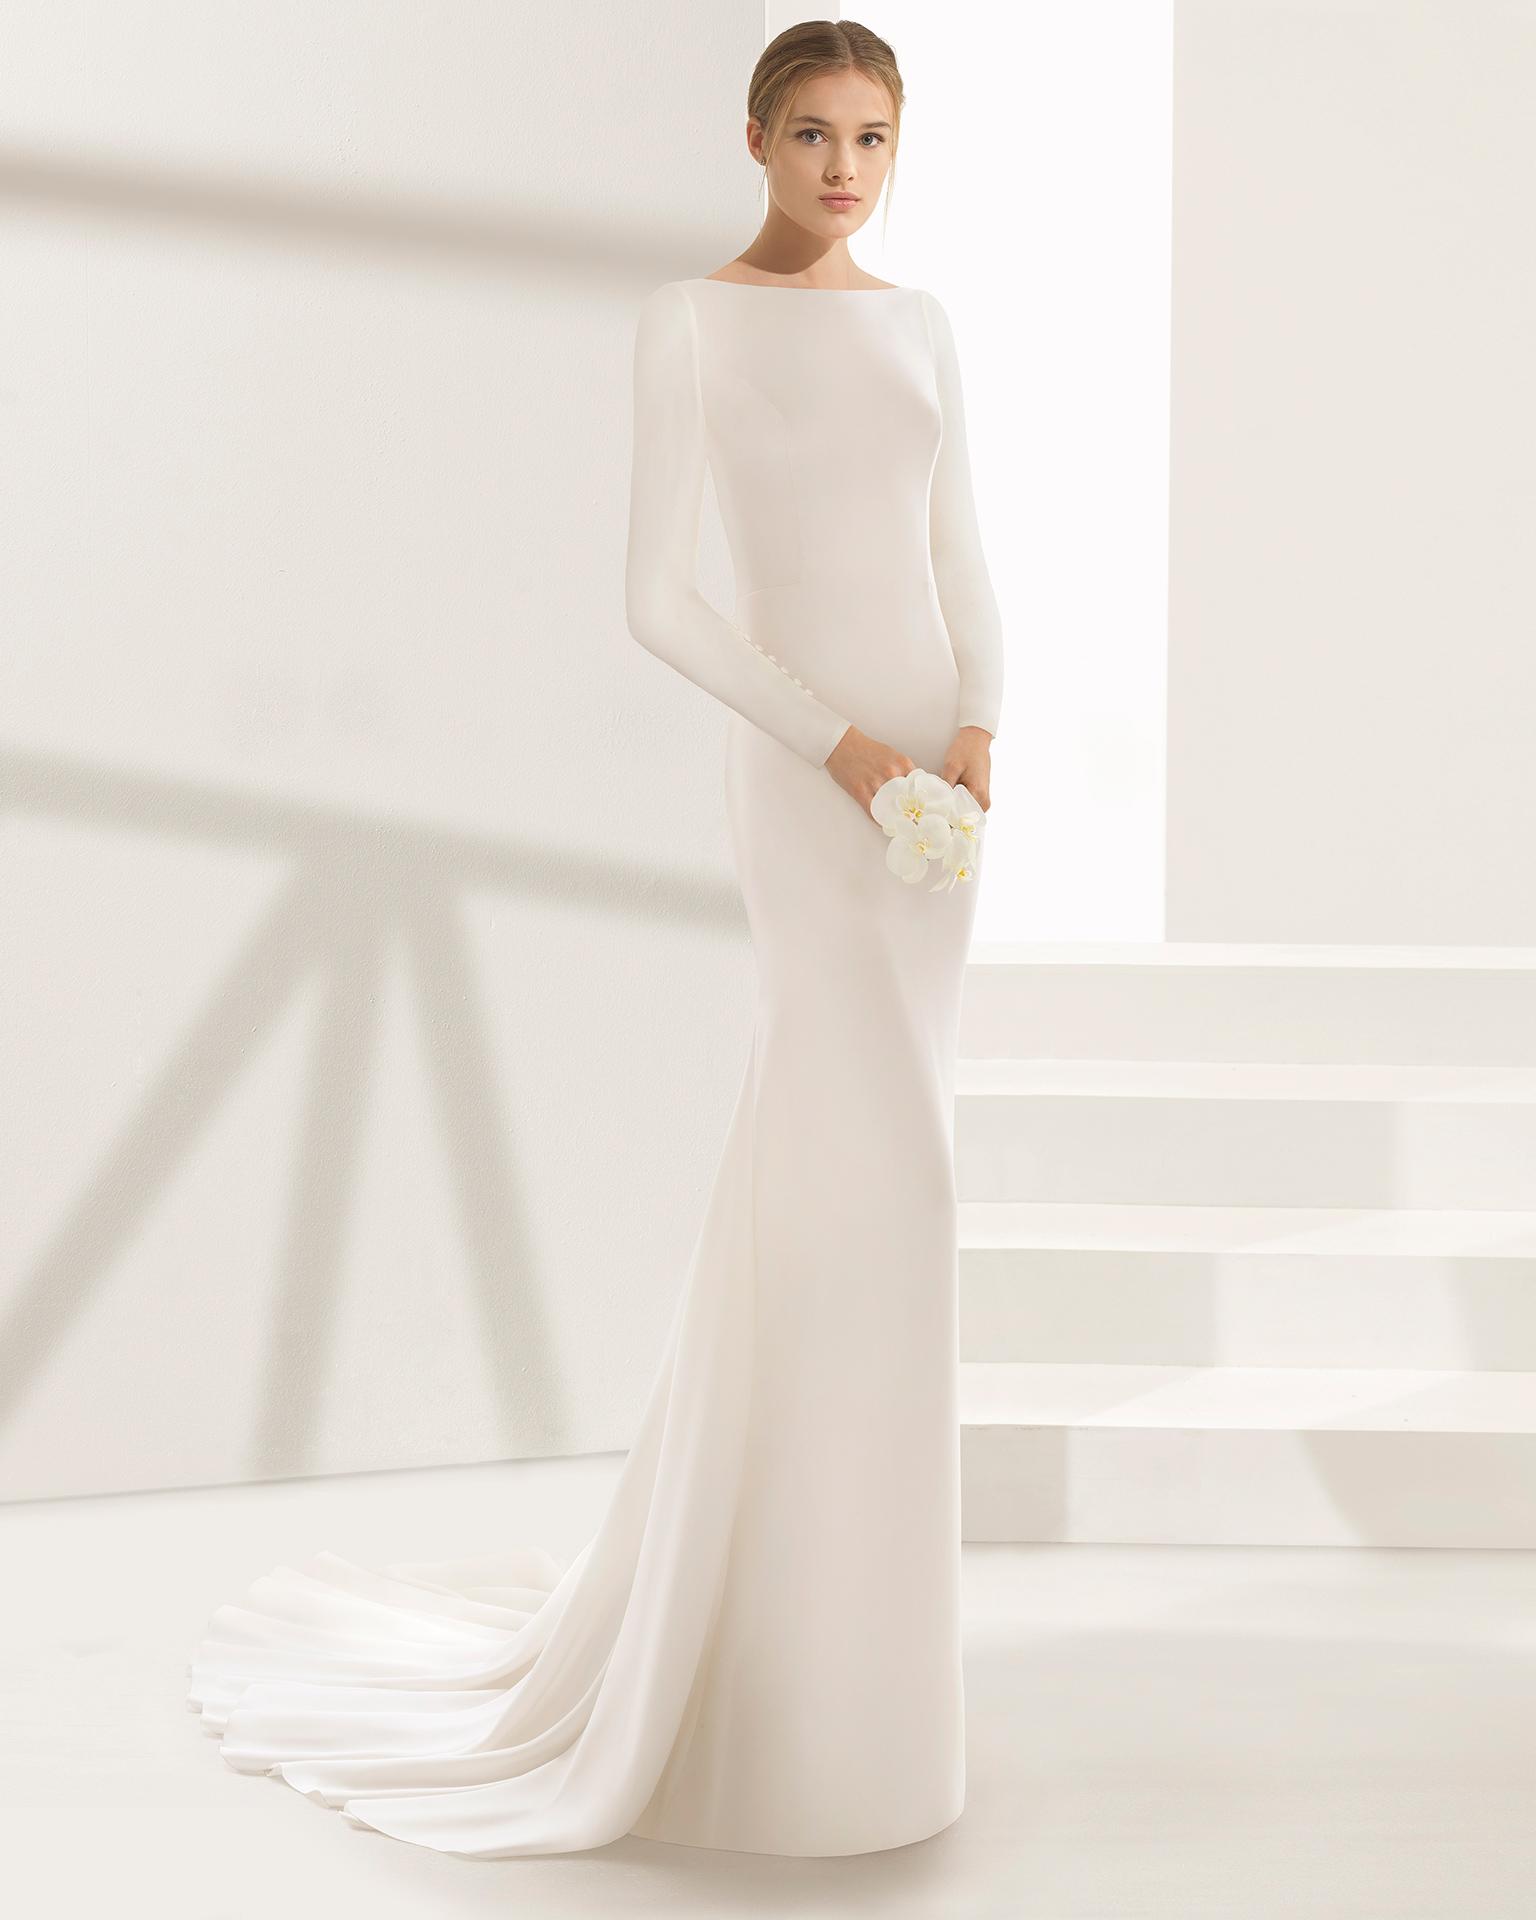 17 Chic, Minimal Wedding Dresses for Modern Brides images 11